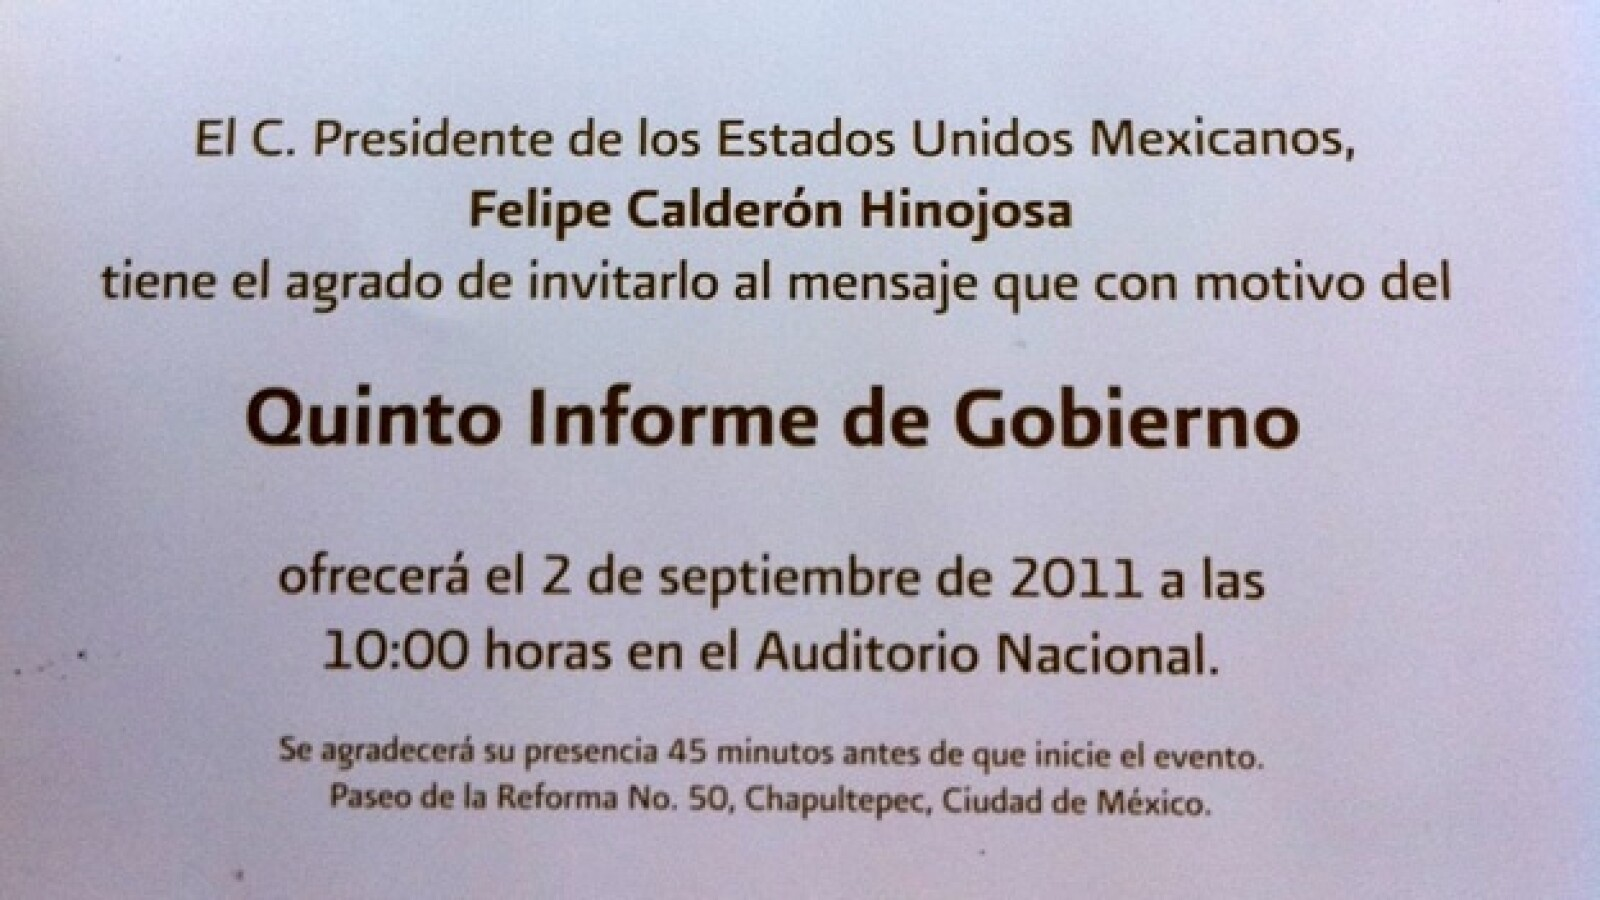 Aspectos quinto informe de gobierno Calderón 10